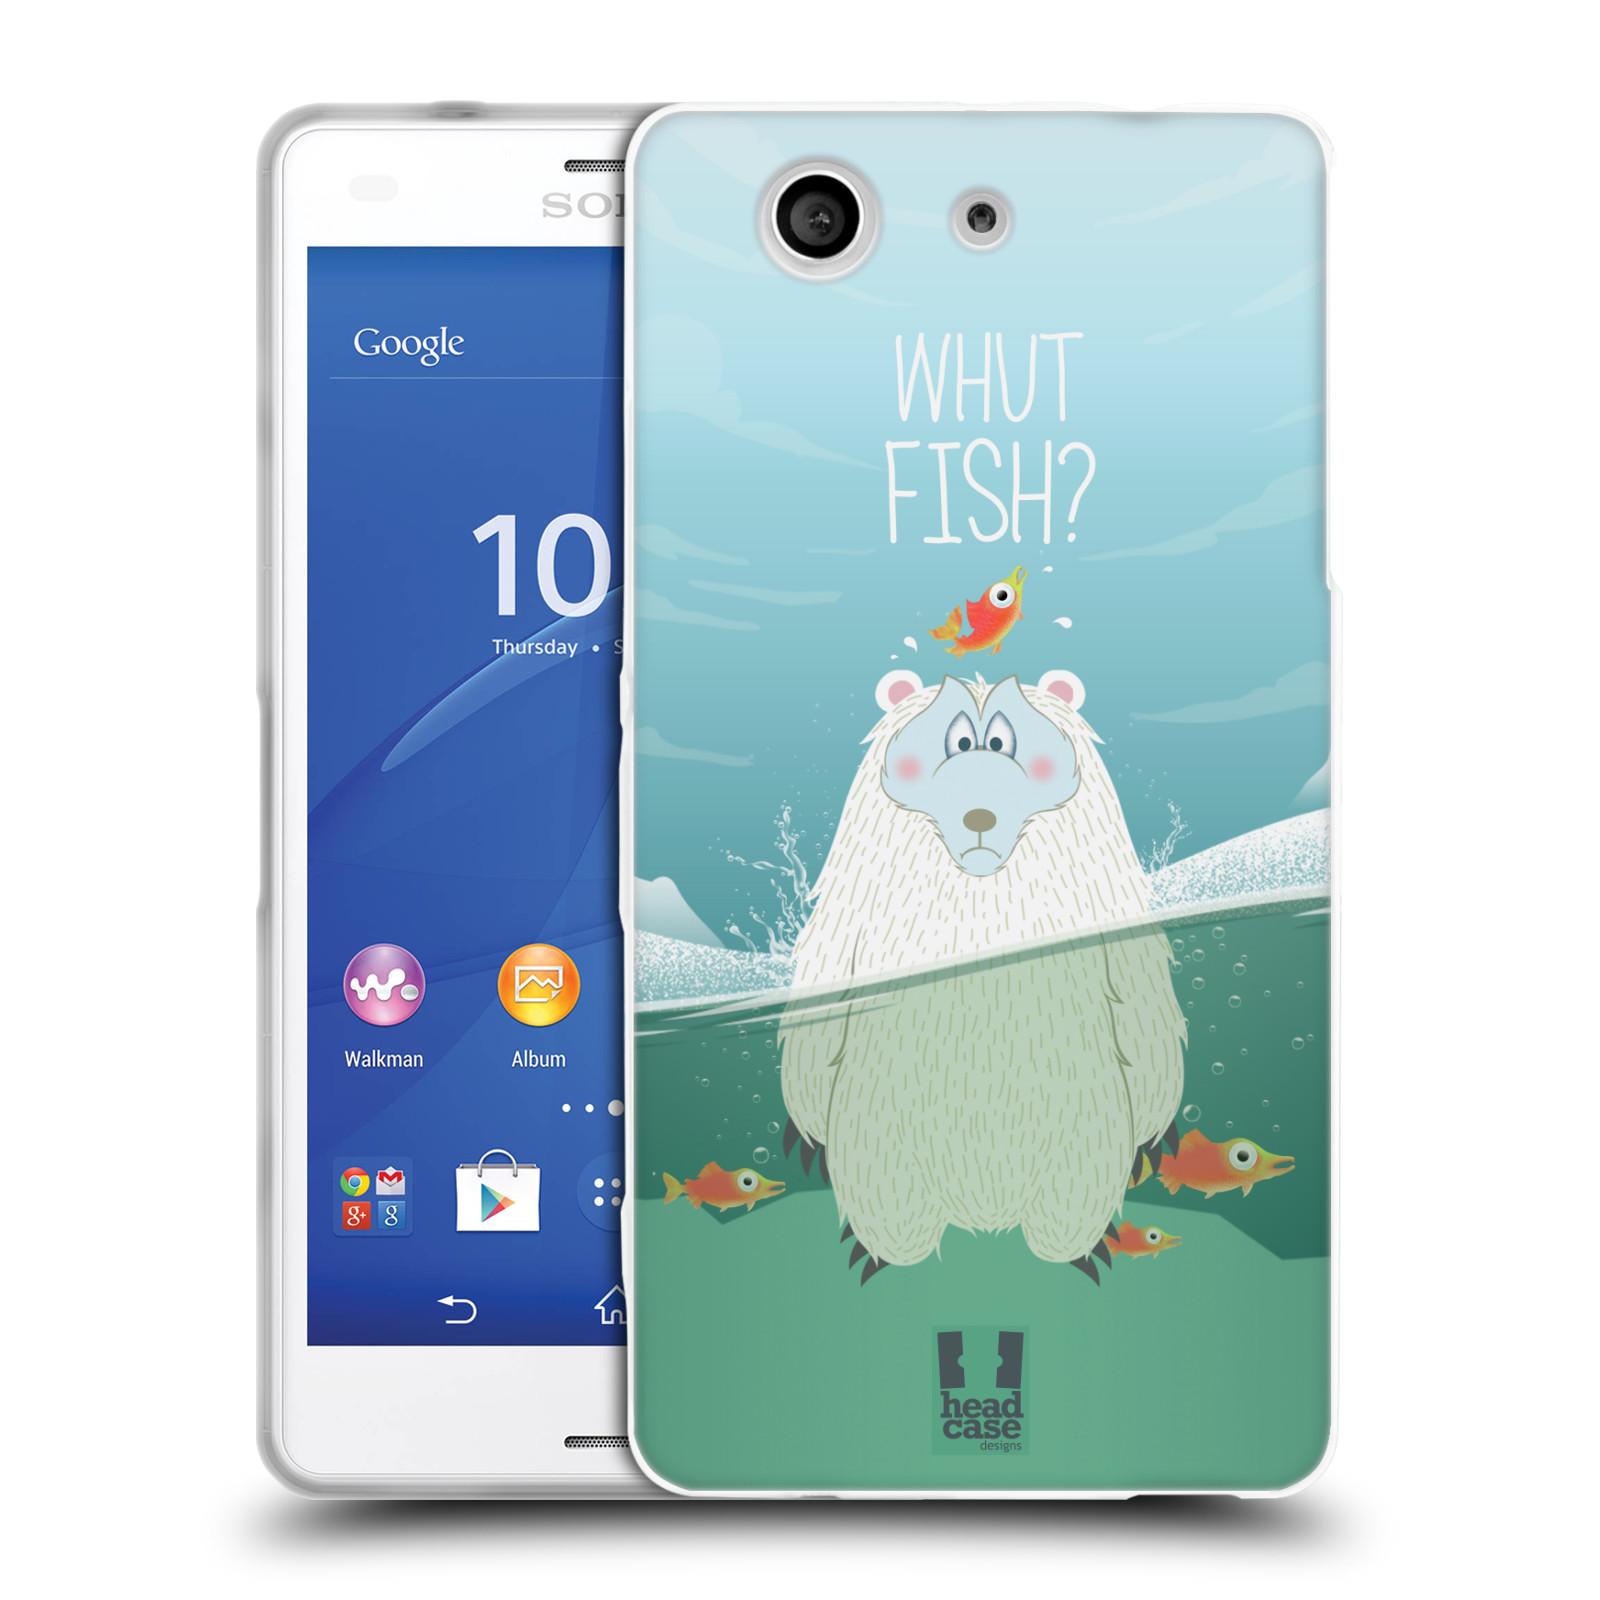 Silikonové pouzdro na mobil Sony Xperia Z3 Compact D5803 HEAD CASE Medvěd Whut Fish?